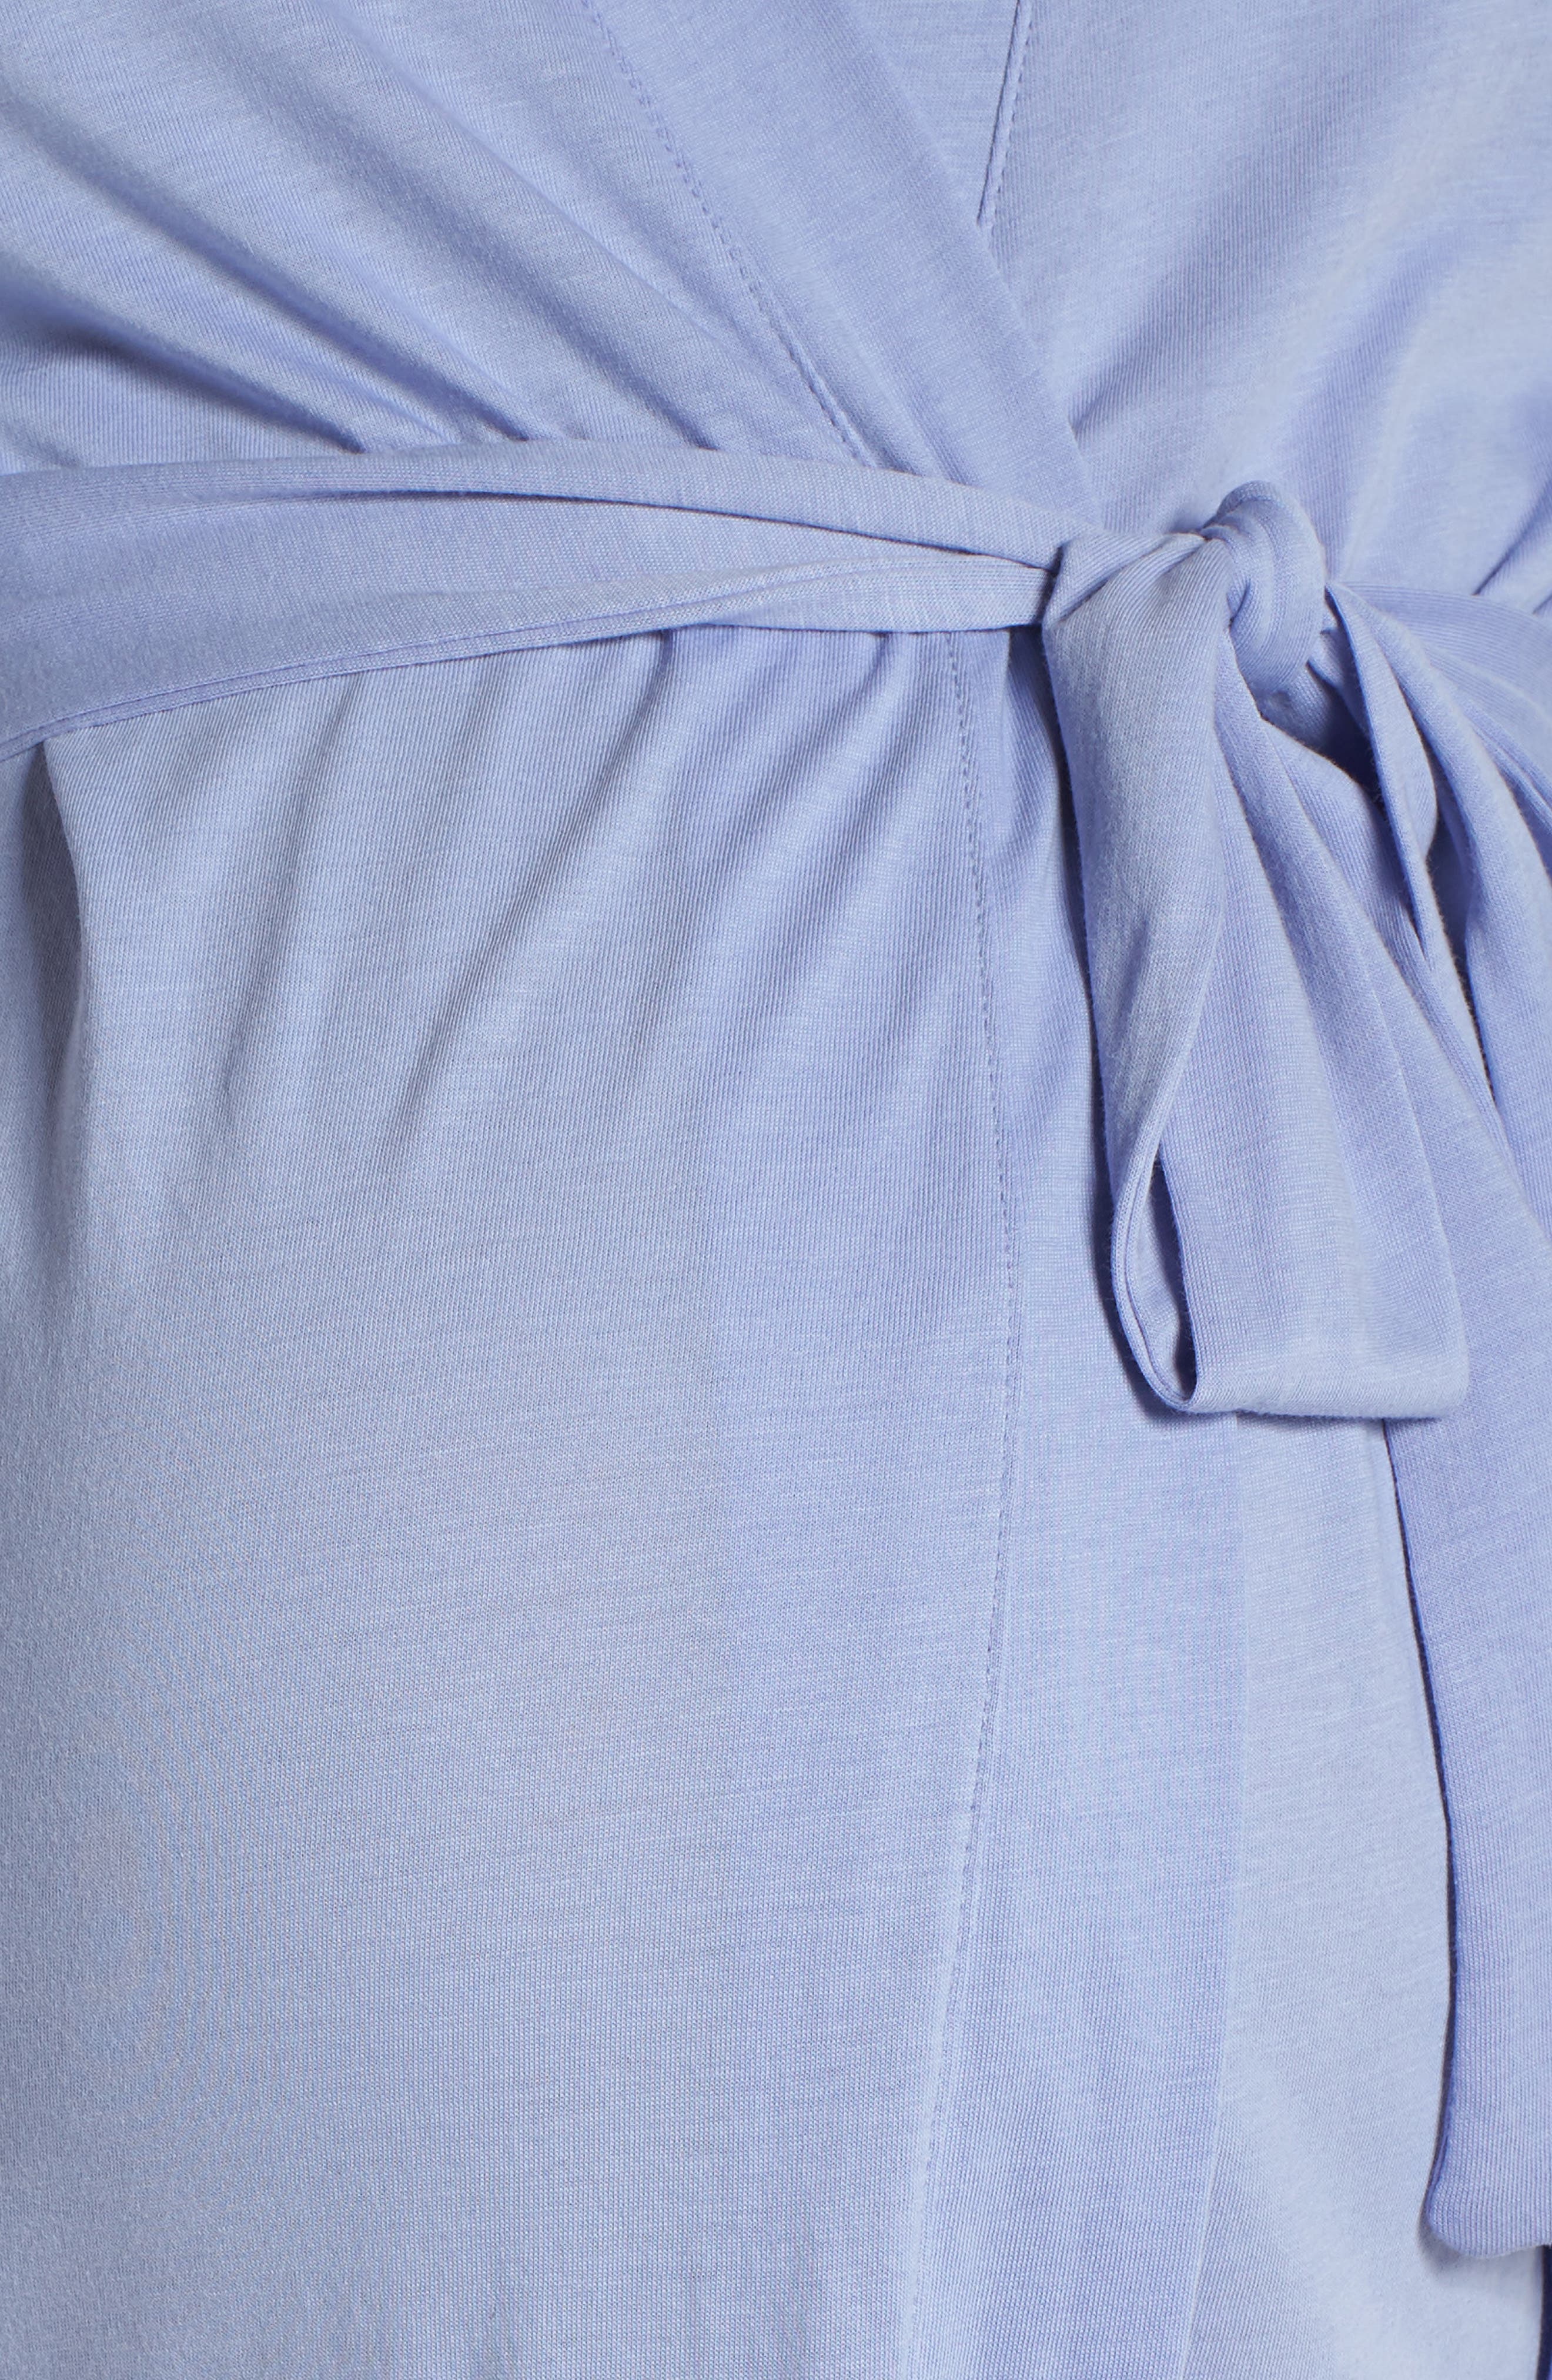 Alternate Image 5  - Belabumbum Violette Maternity/Nursing Robe